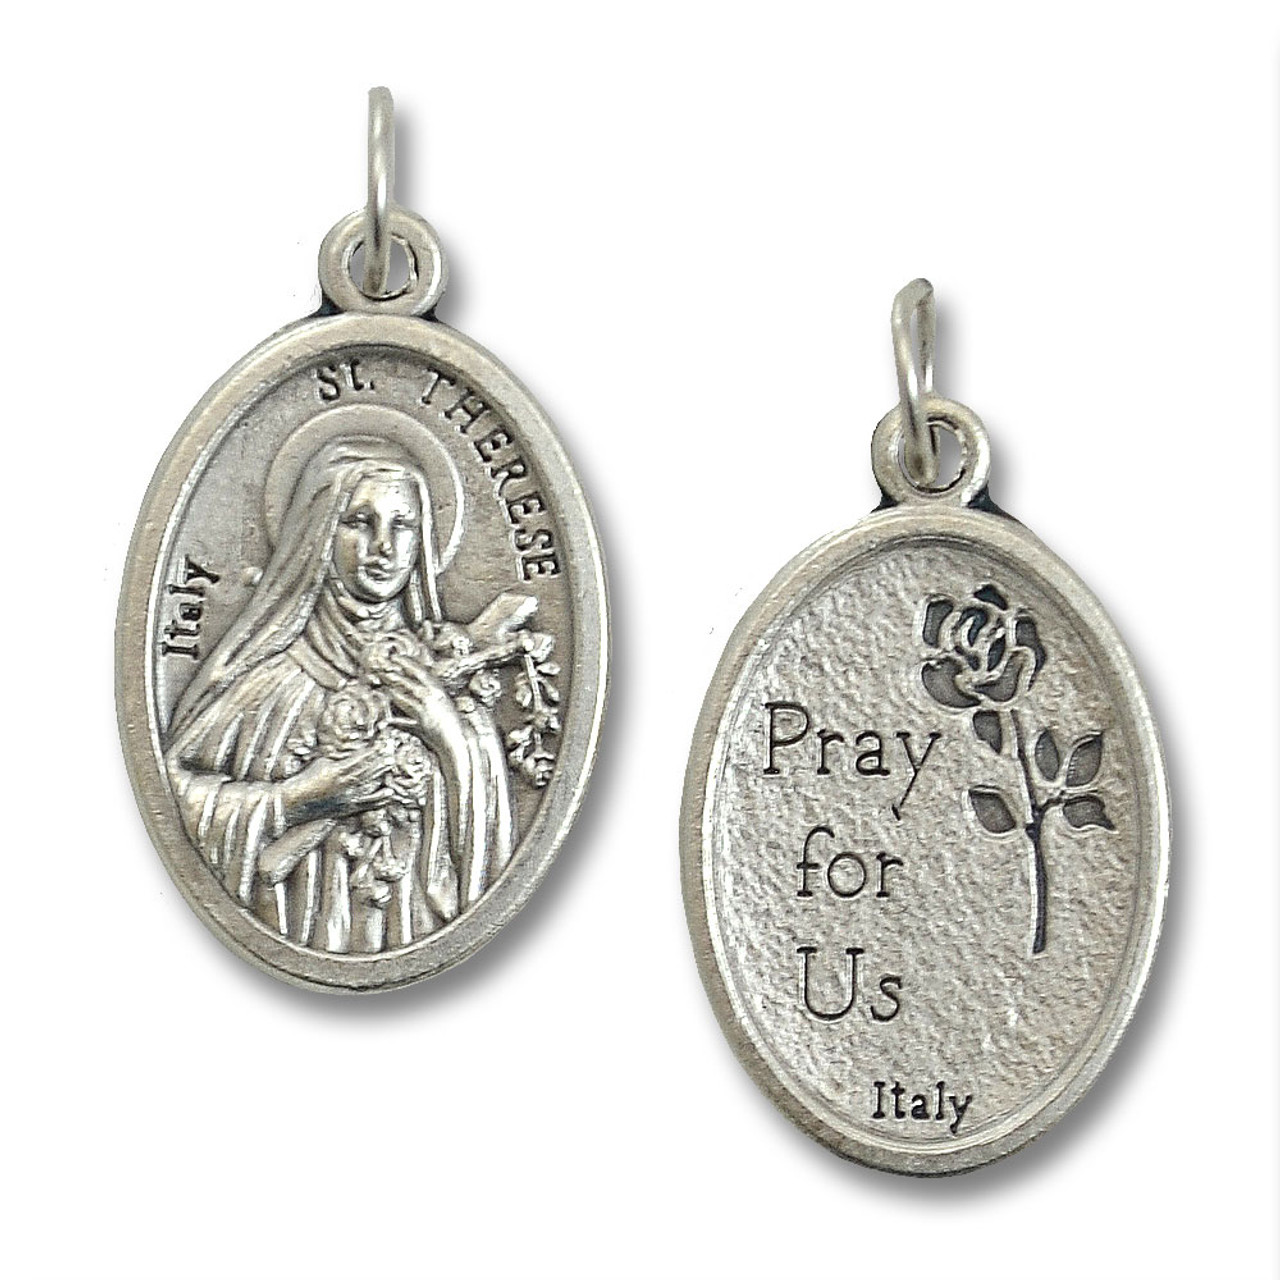 St. Theresa Devotional Medal